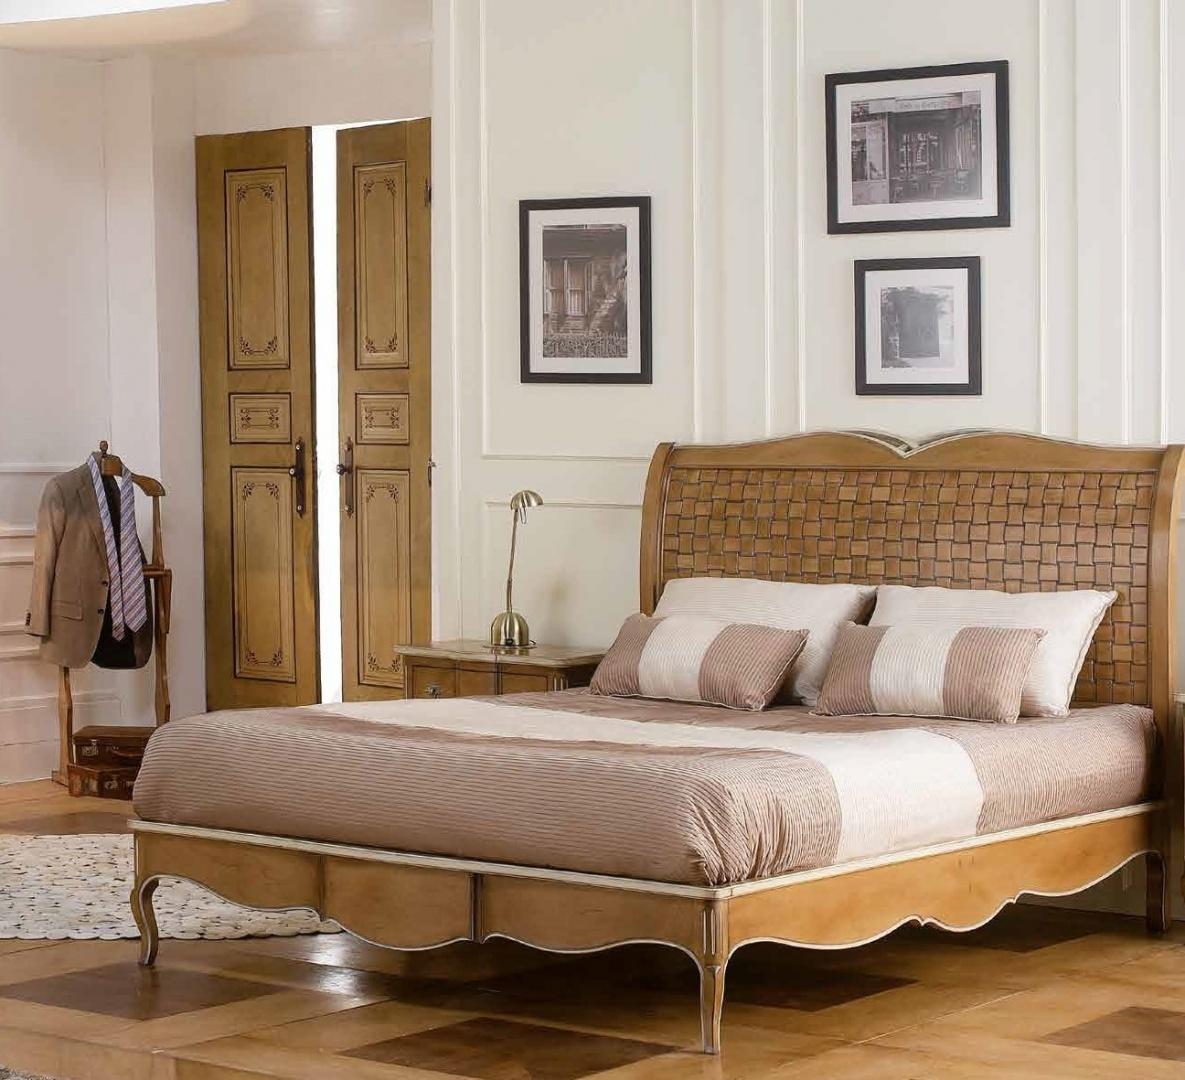 Dalila кровать 160*200 11704